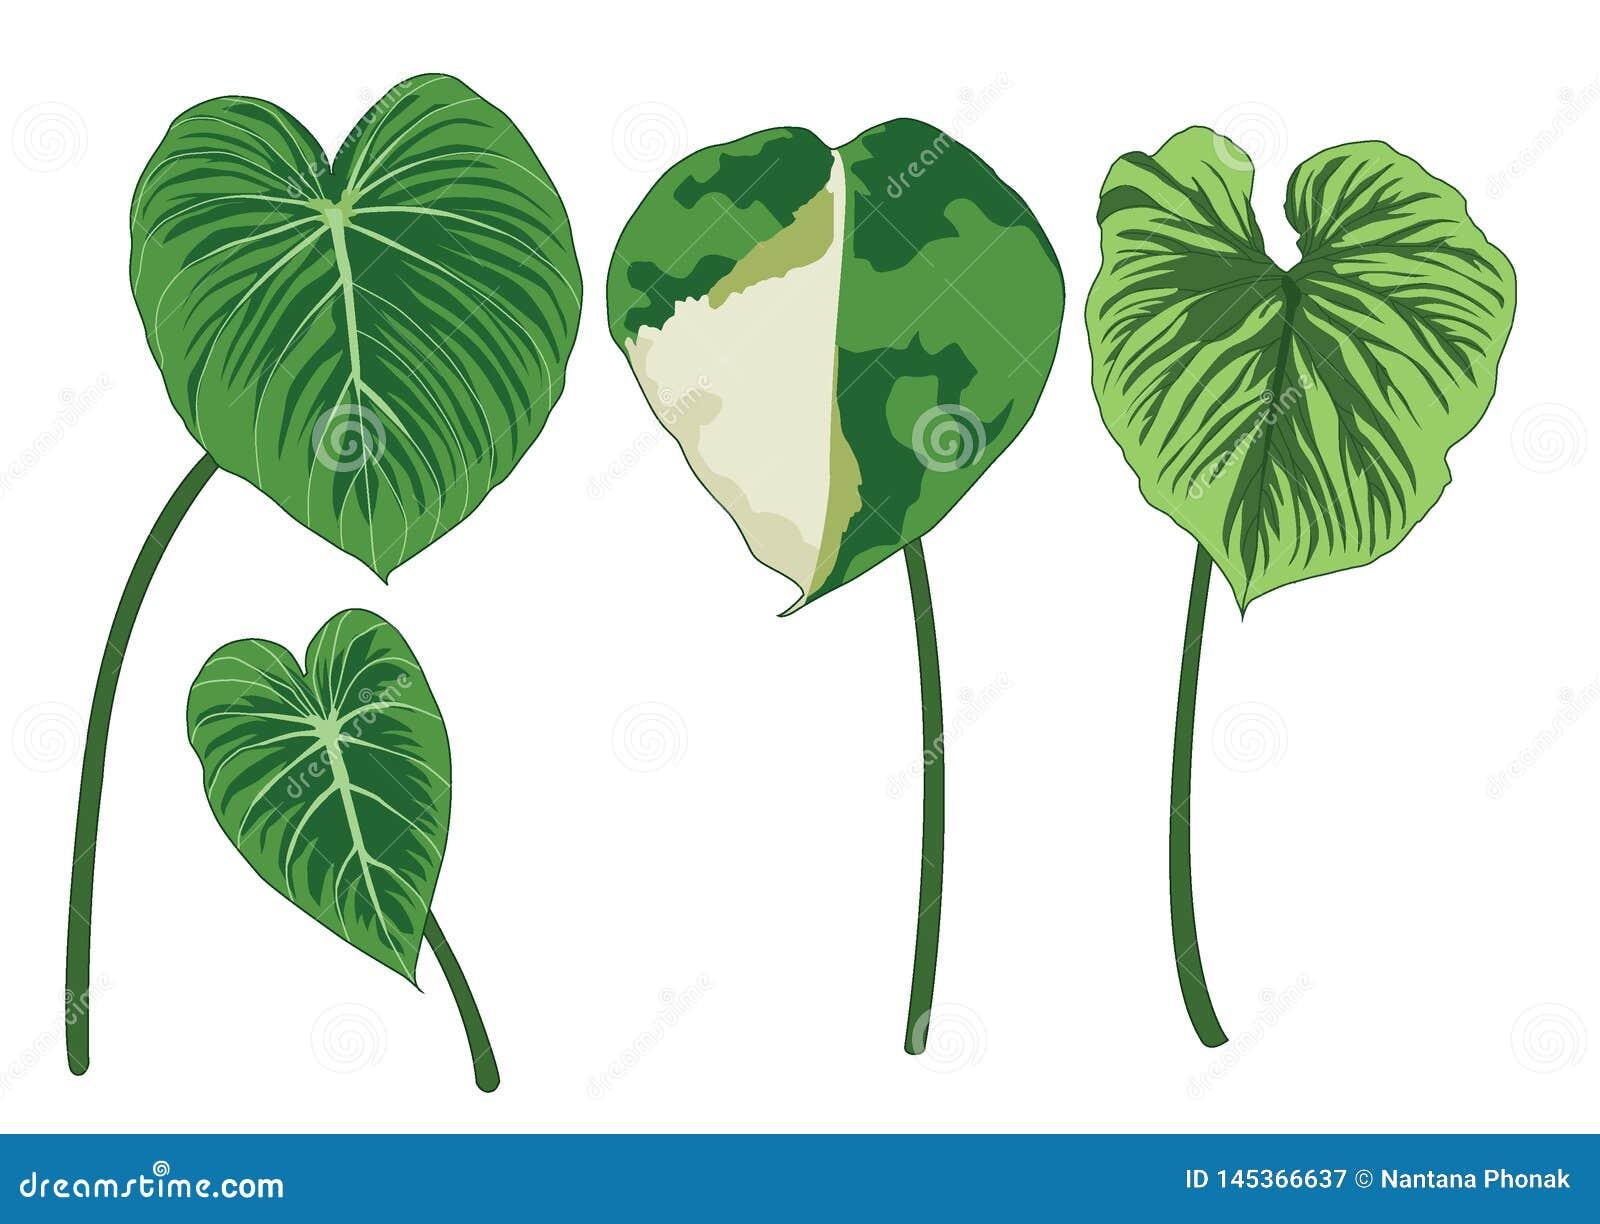 Groene Bladeren op witte illustratie als achtergrond